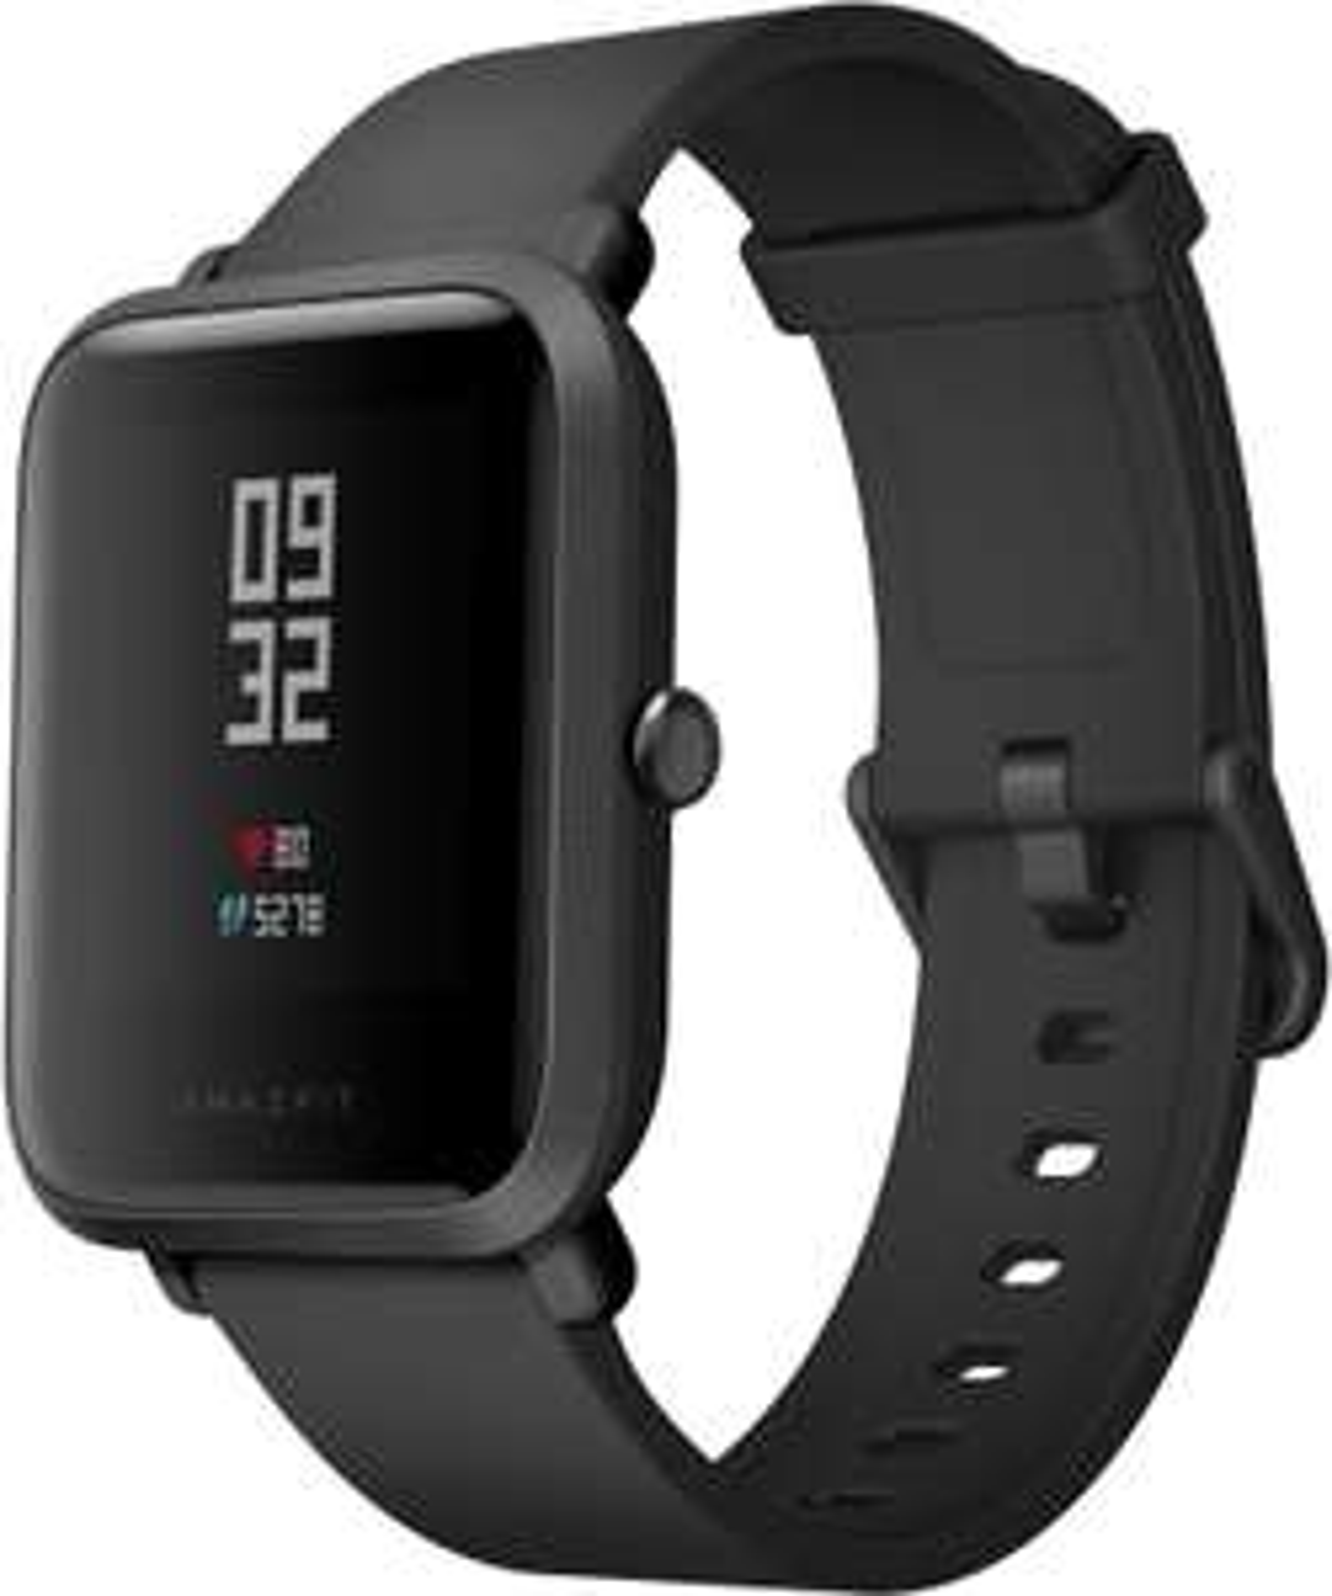 "Huami Amazfit BIP: Smartwatch (1,28"" Display, GPS/Glonass, 40 Tage Akku, IP68 Wasserdicht) | Versand aus EU"